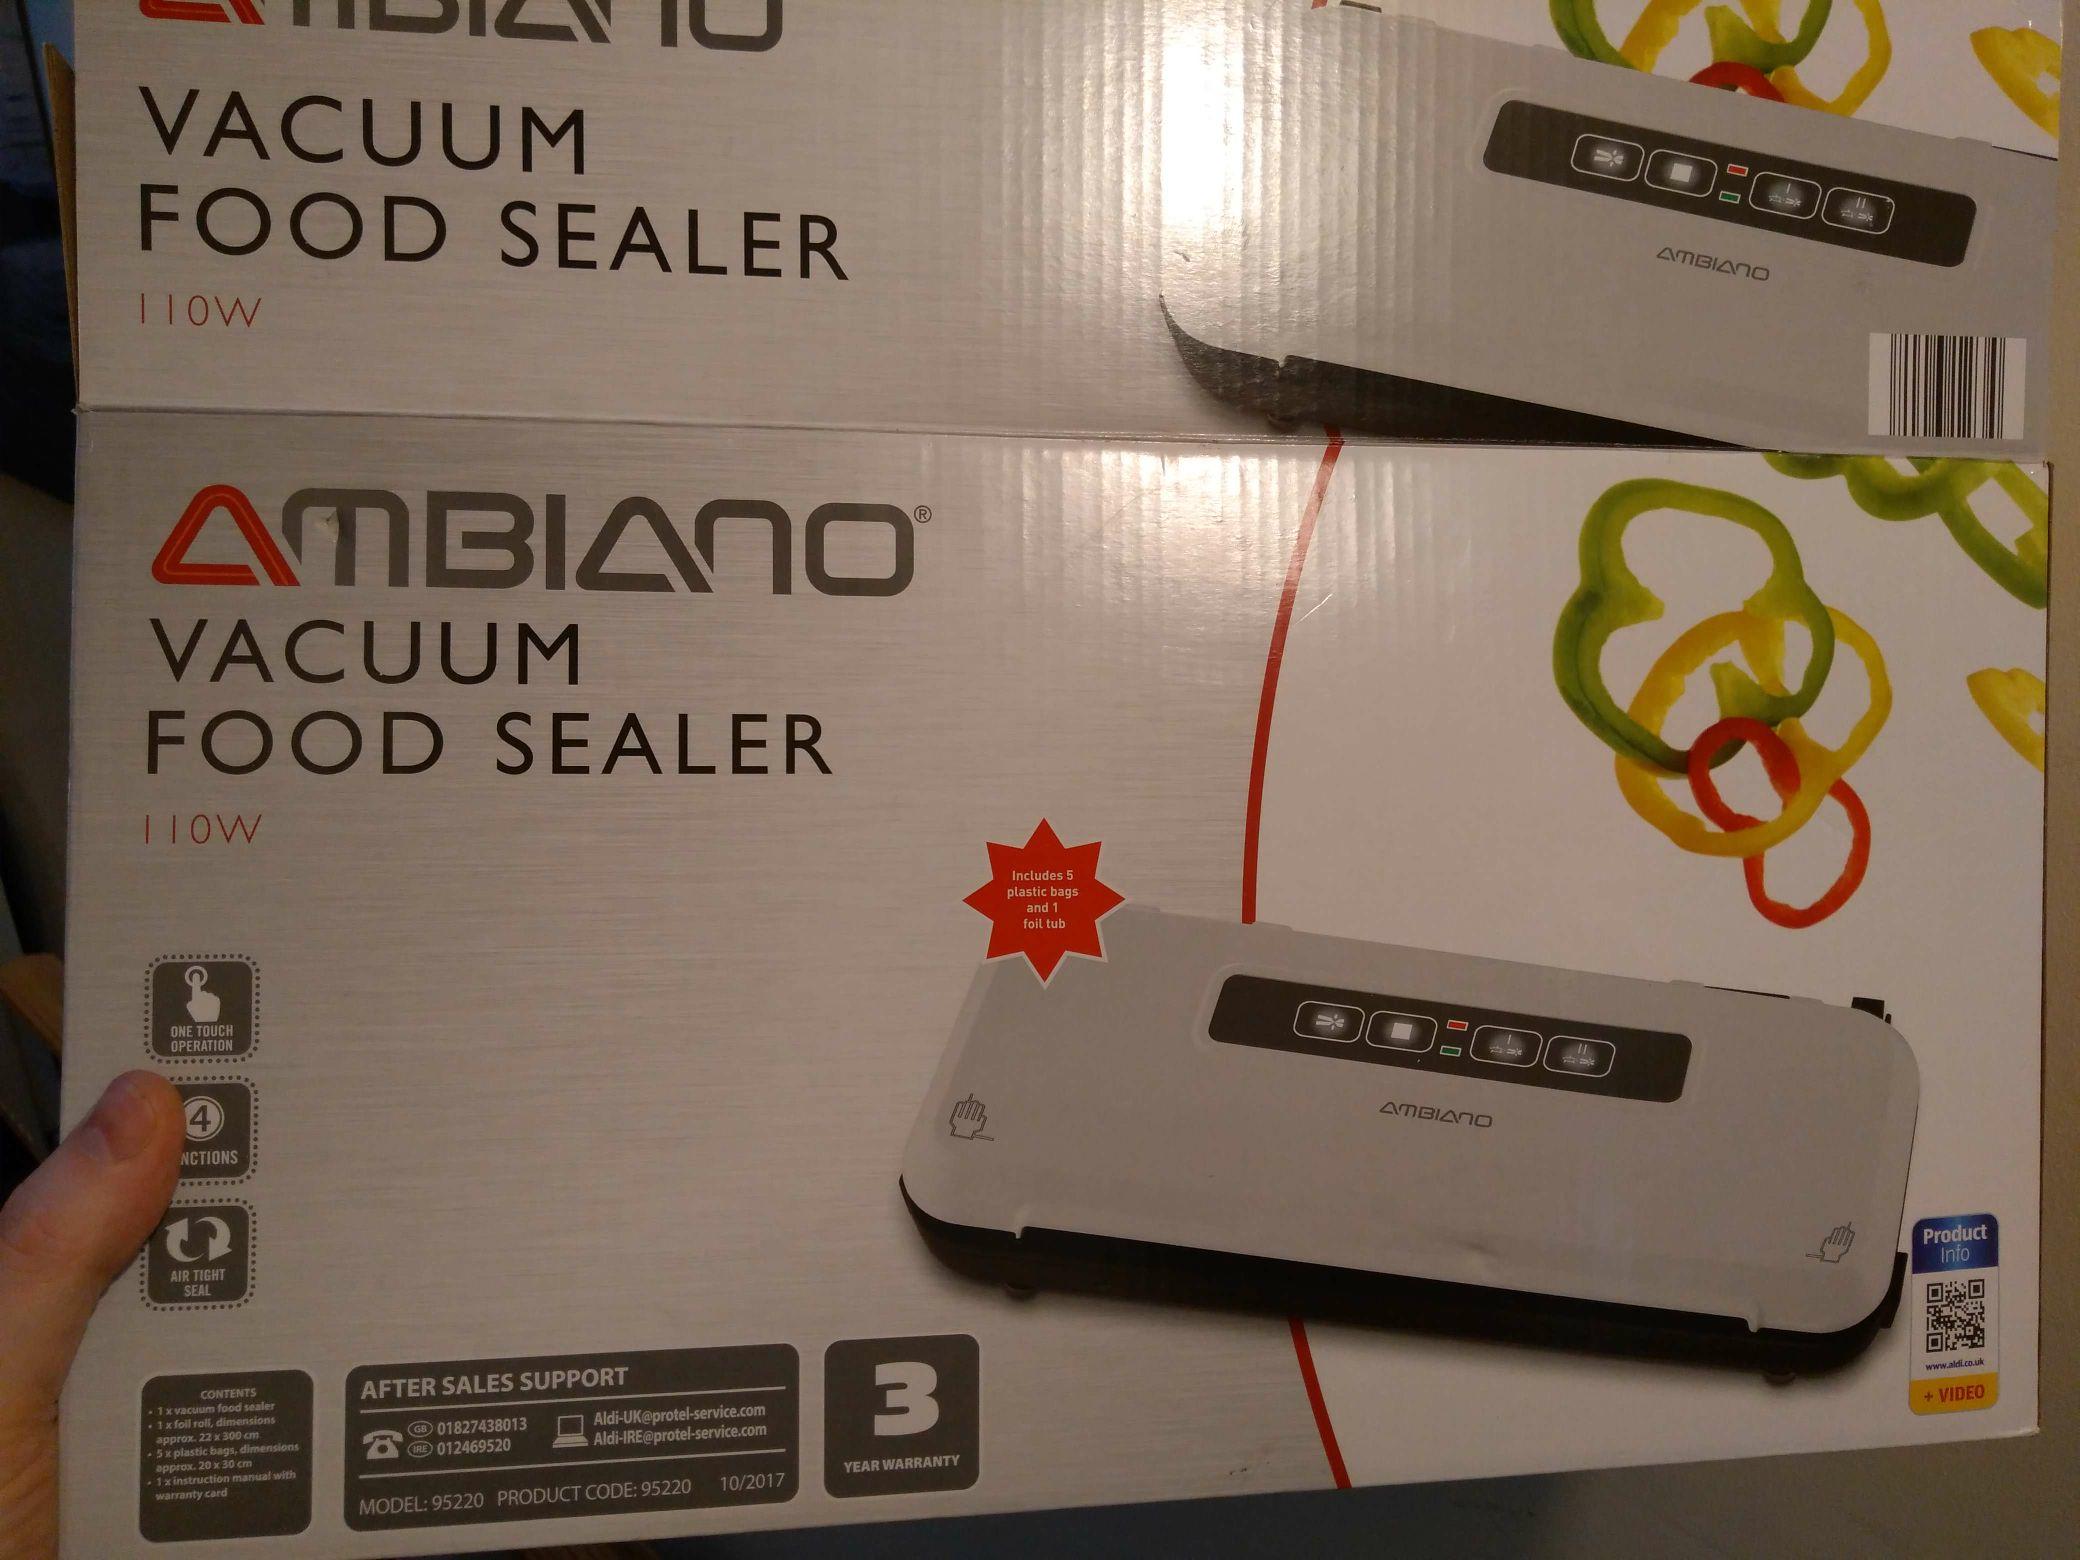 Ambiano Vacuum Food Sealer 110w £7.99 instore @ Aldi